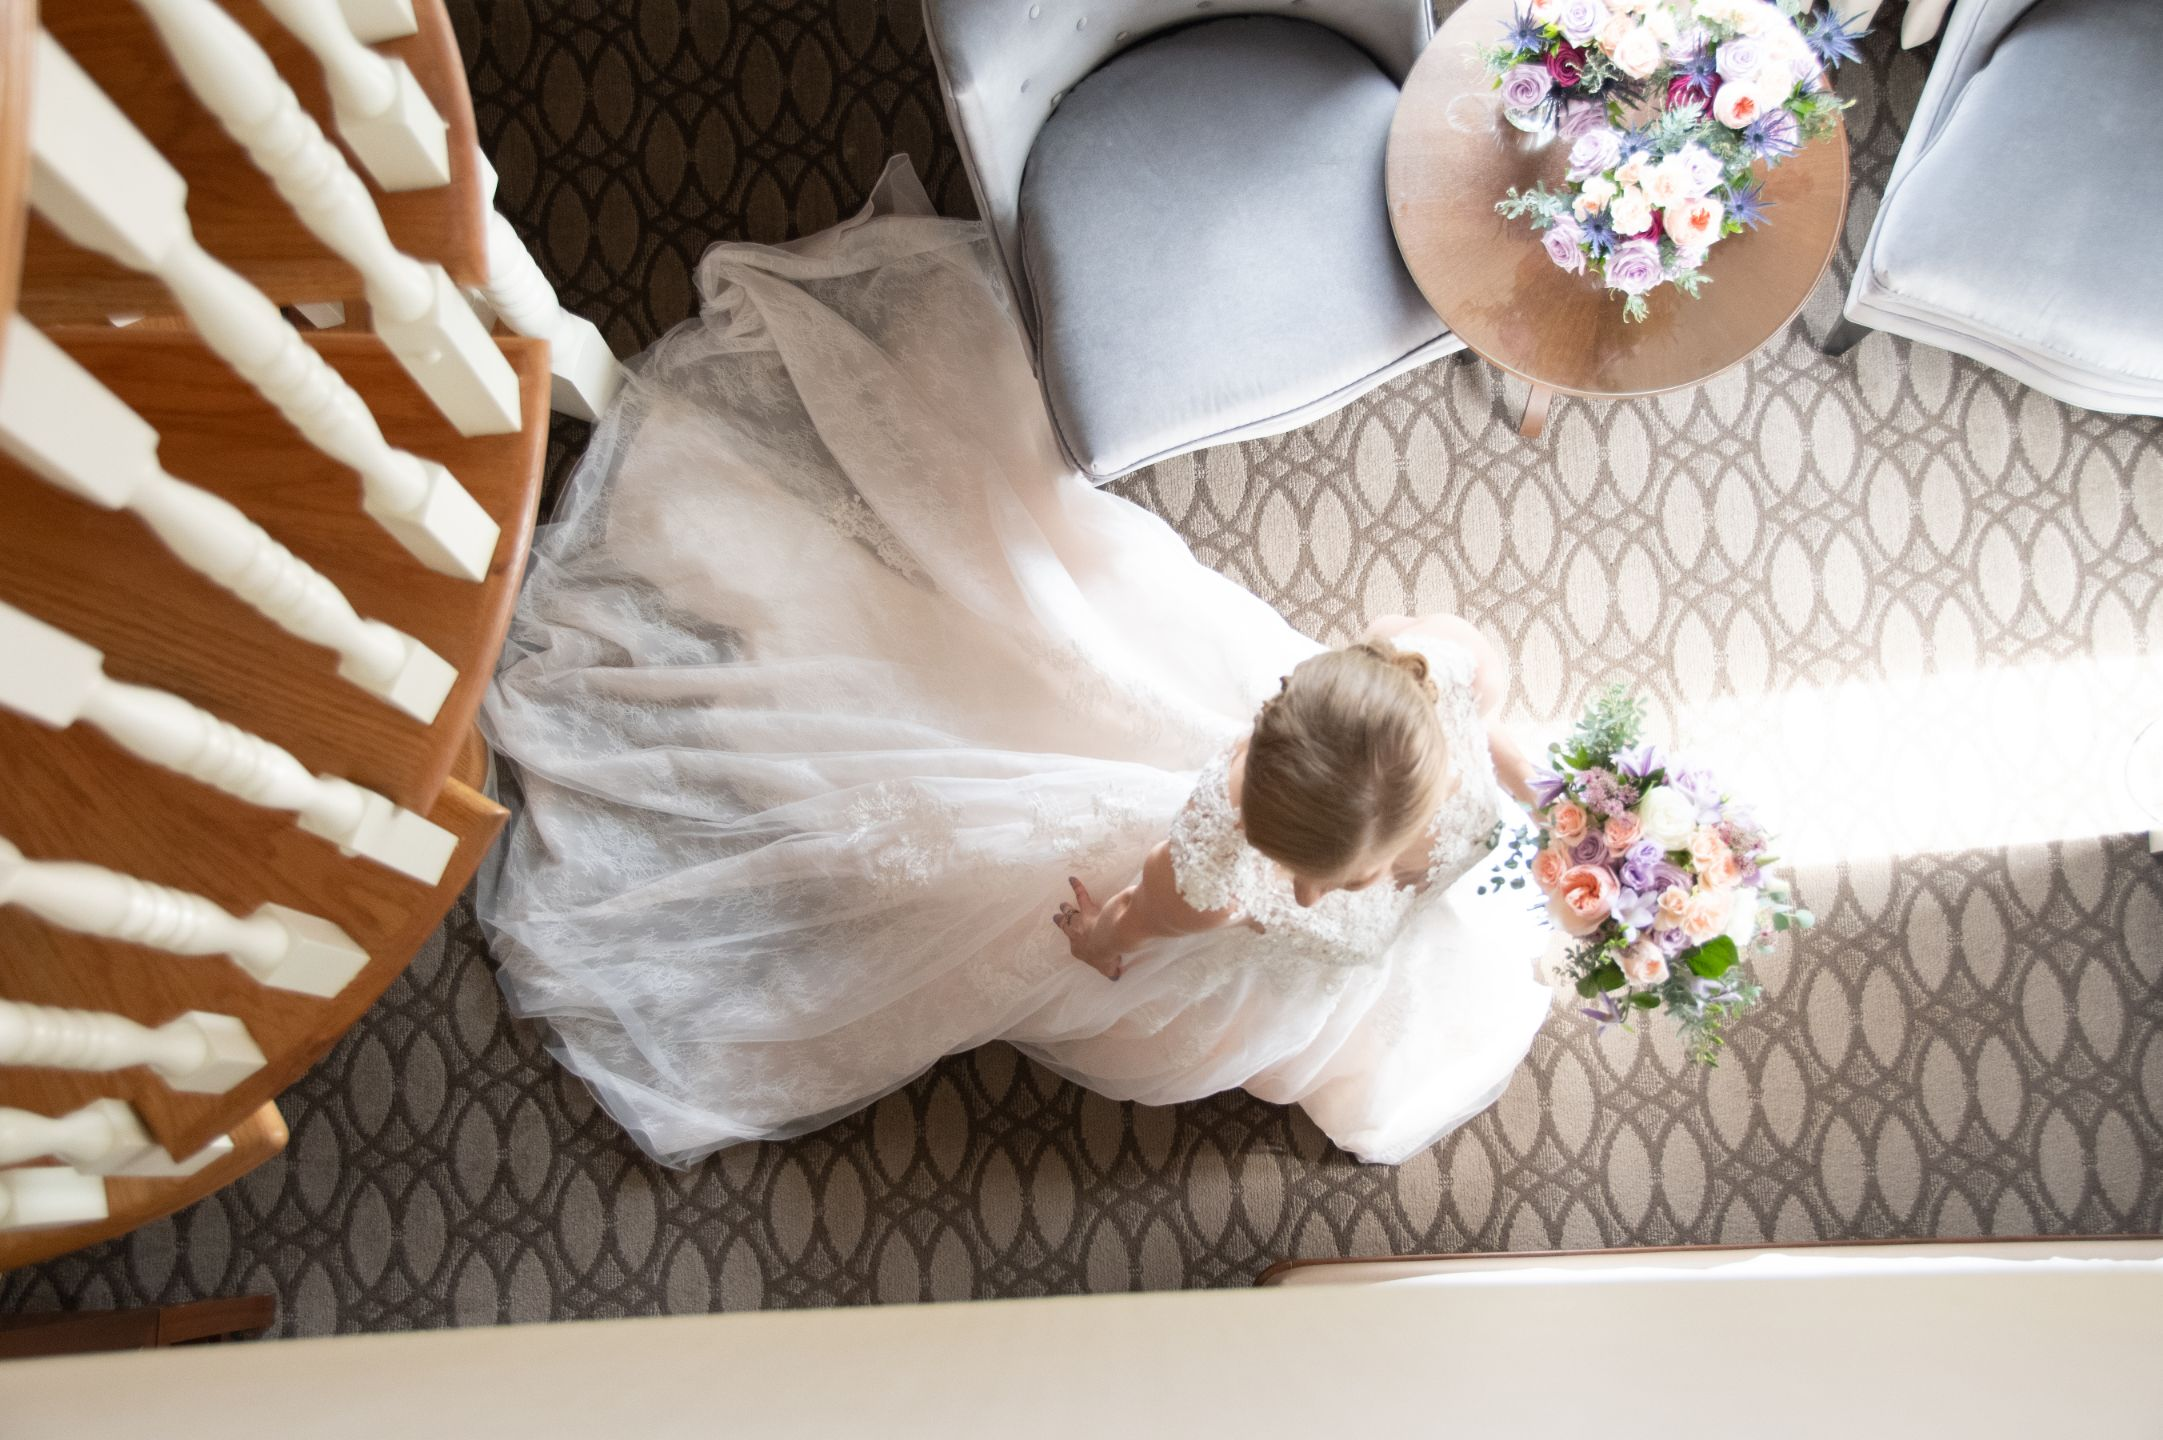 realwedding riko rosete jenna allard new hampshire 0